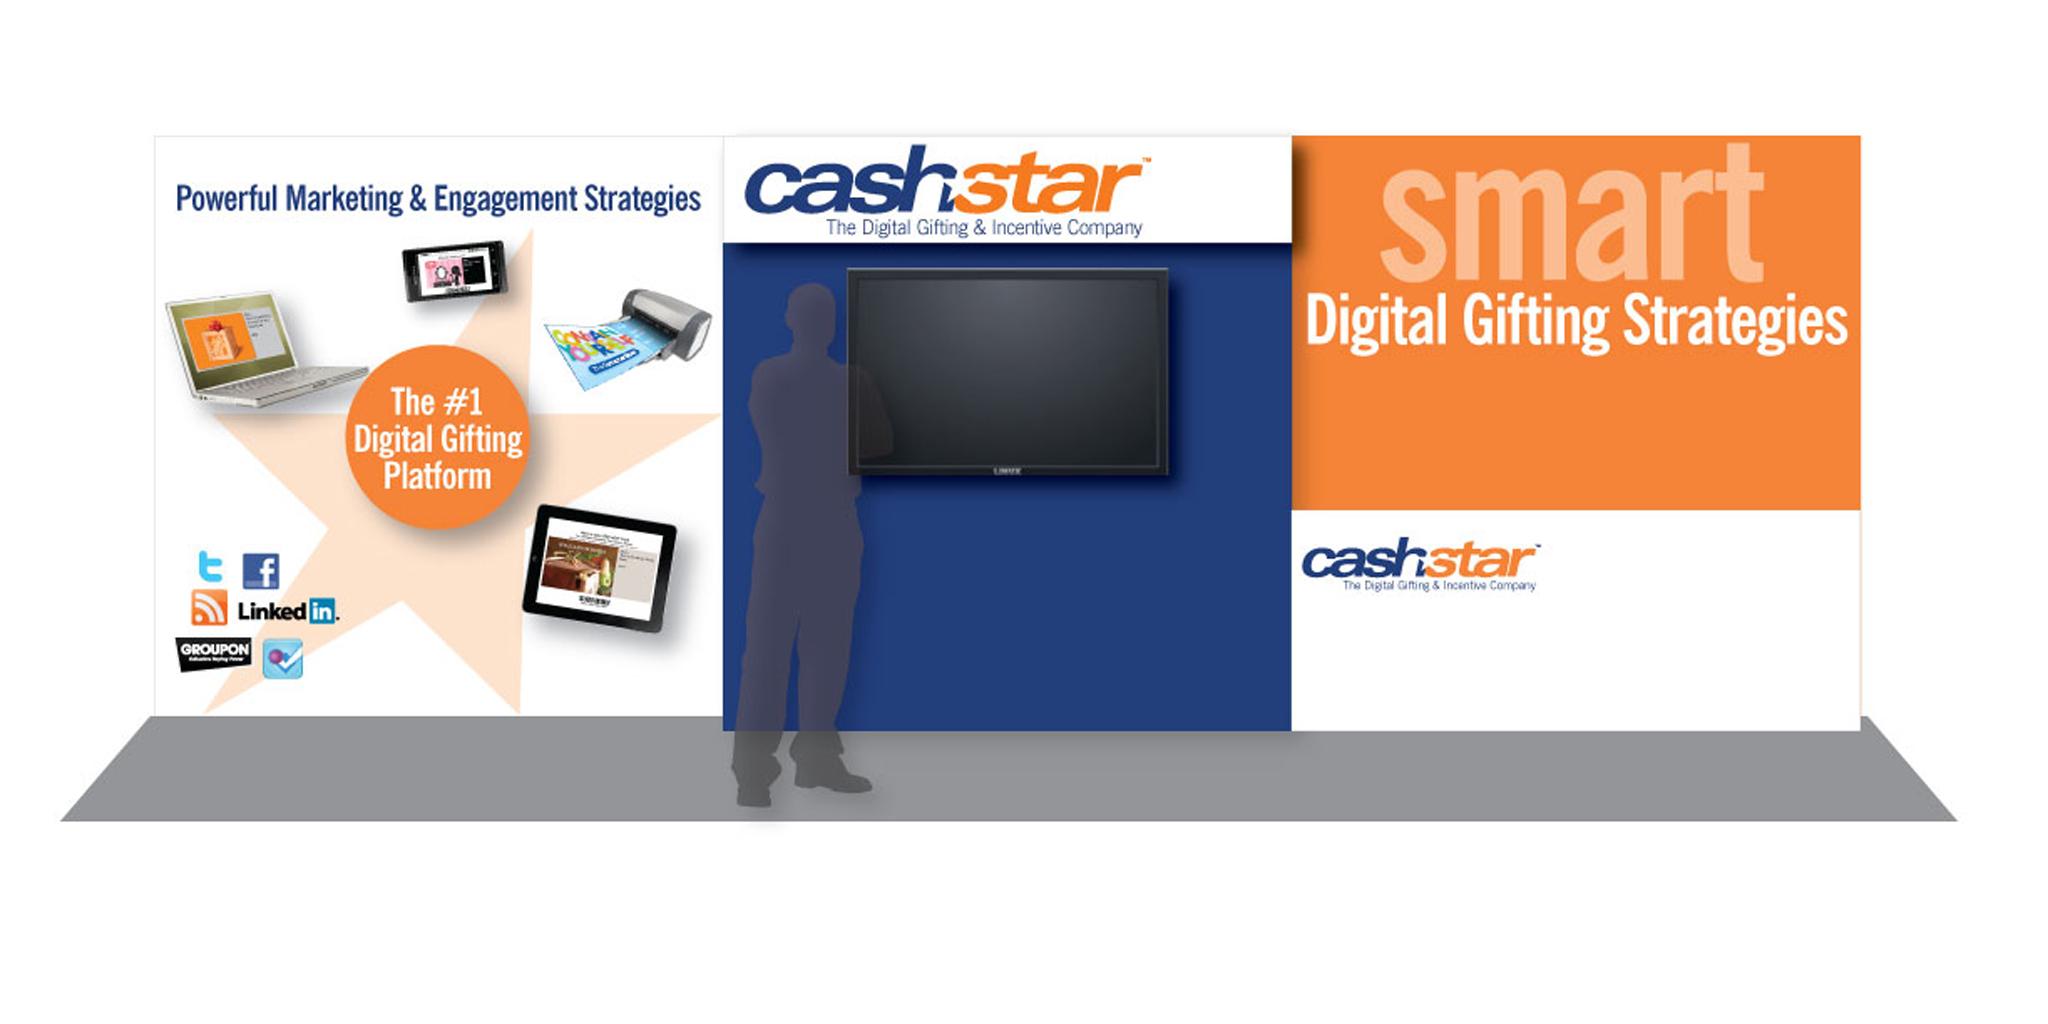 CashStar_Booth_091710_1024.jpg